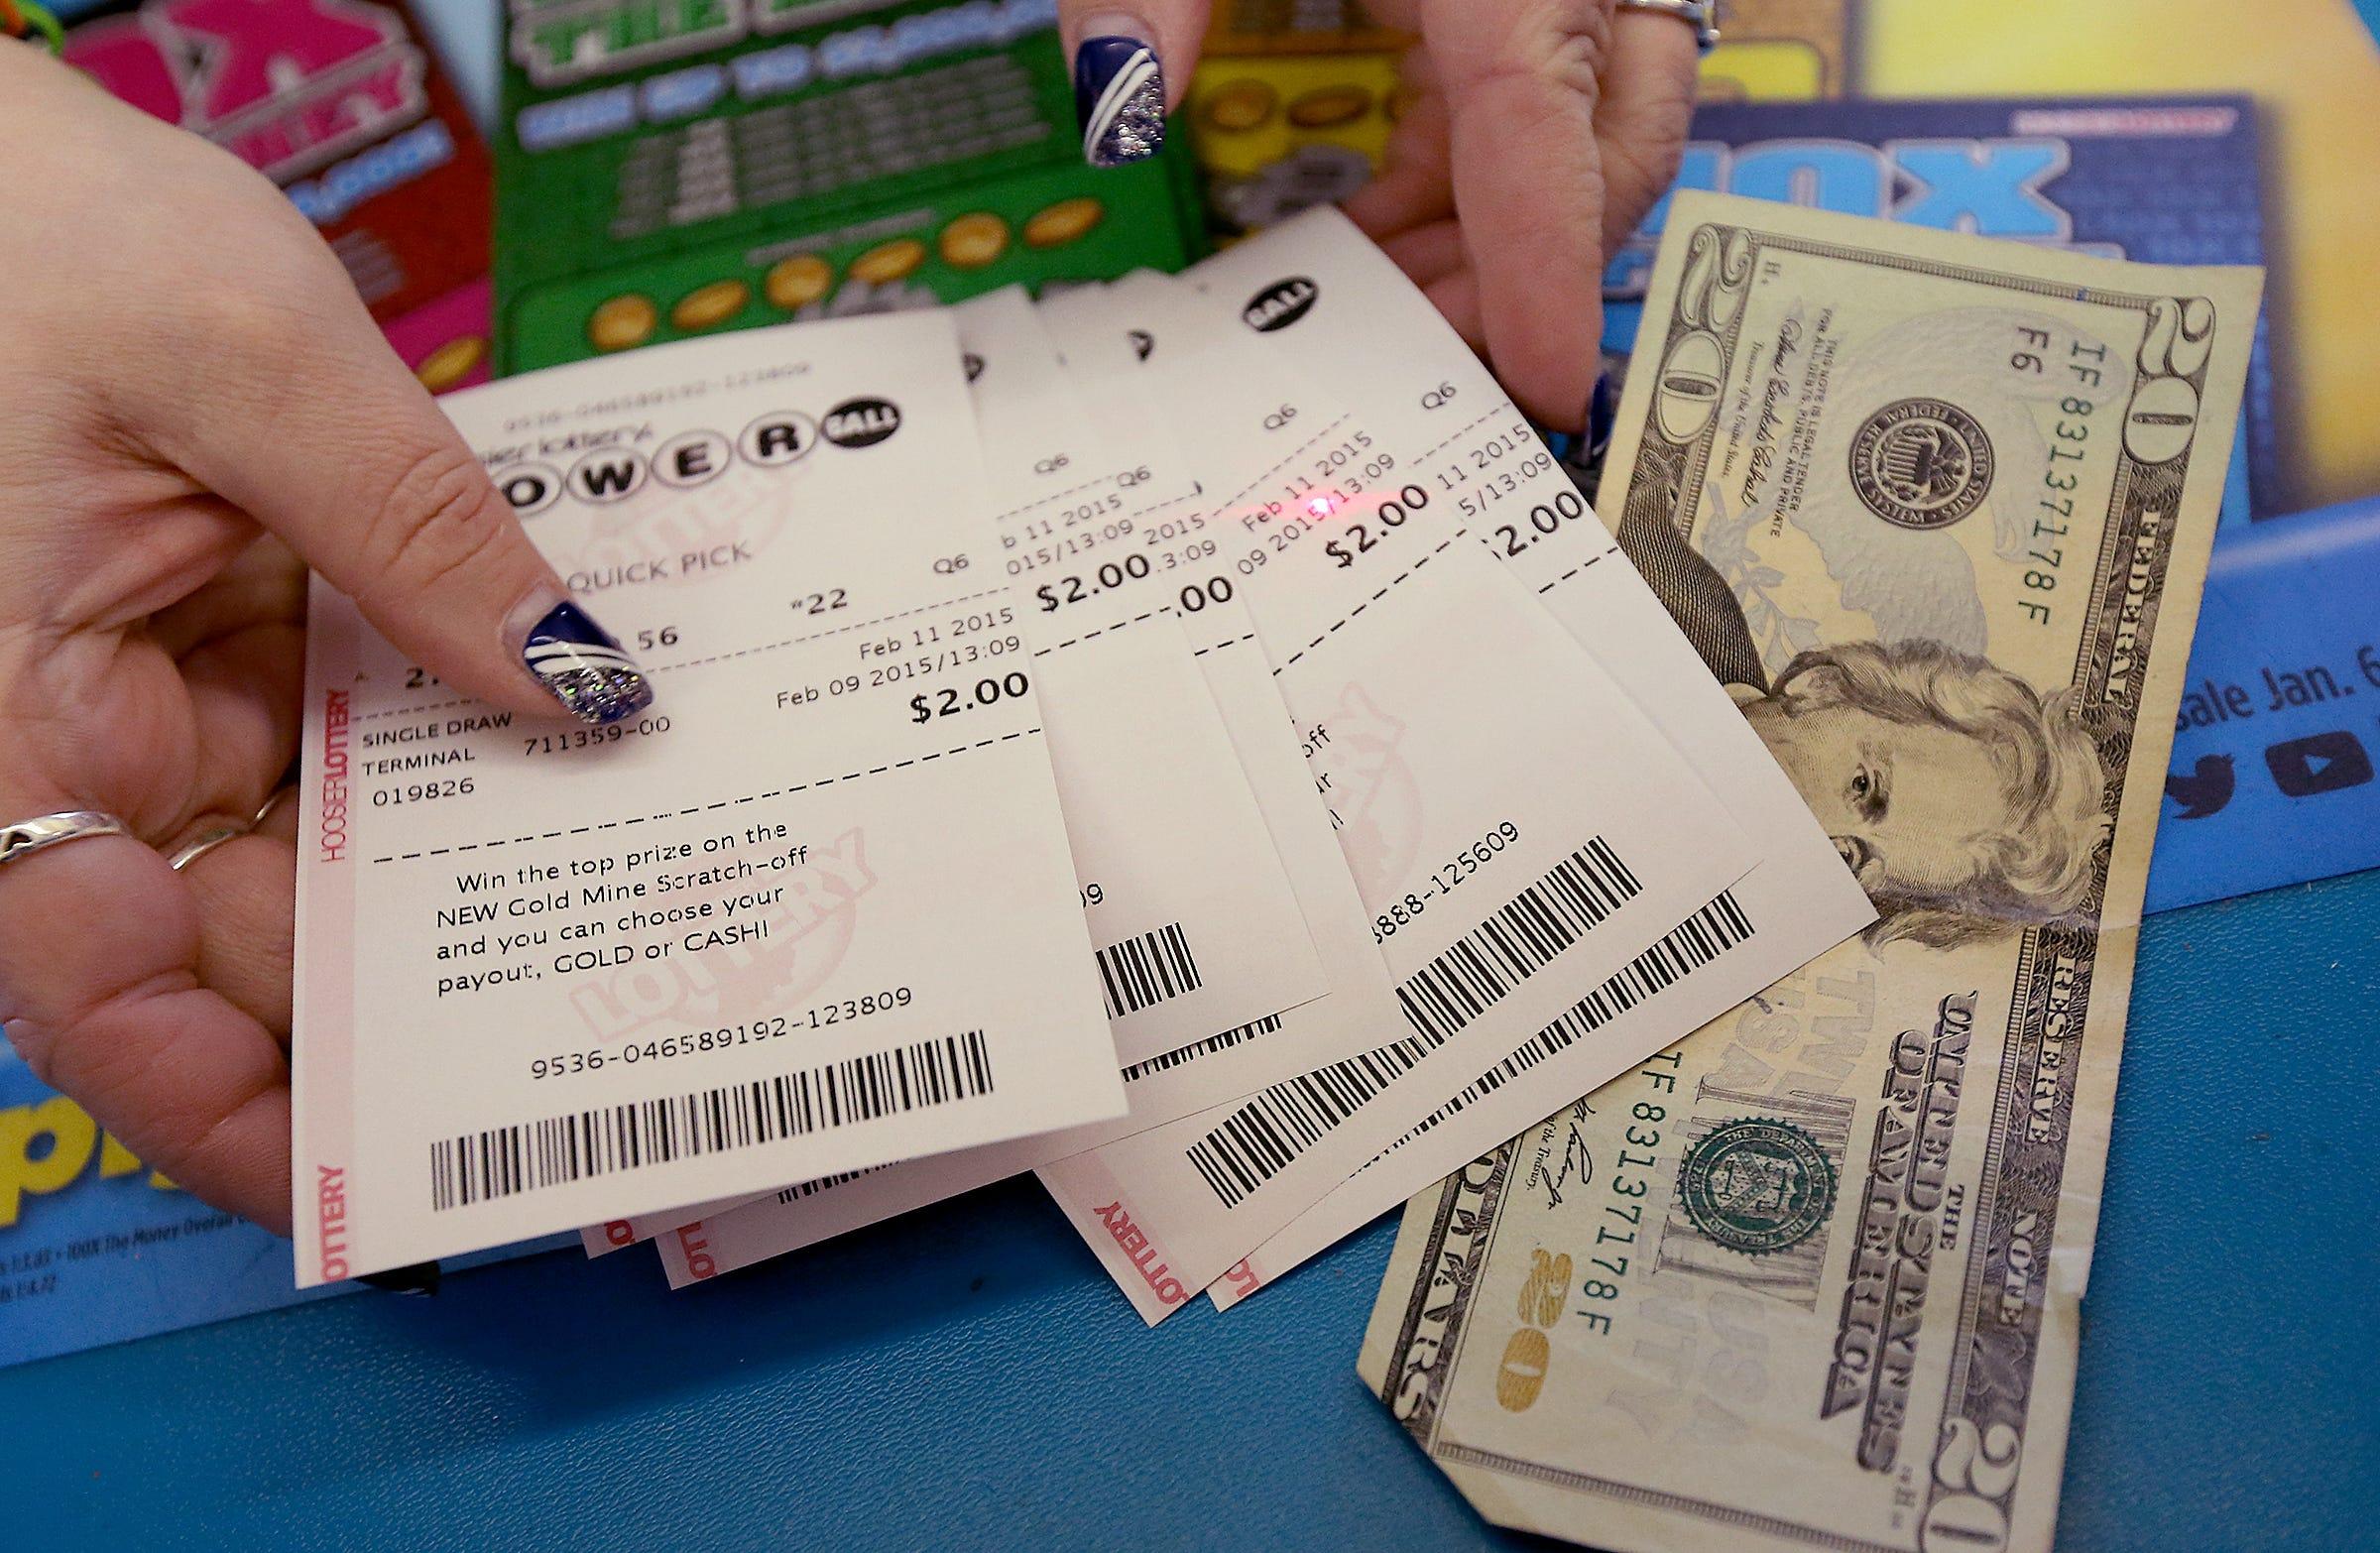 The 1 million cash card prizes for mega